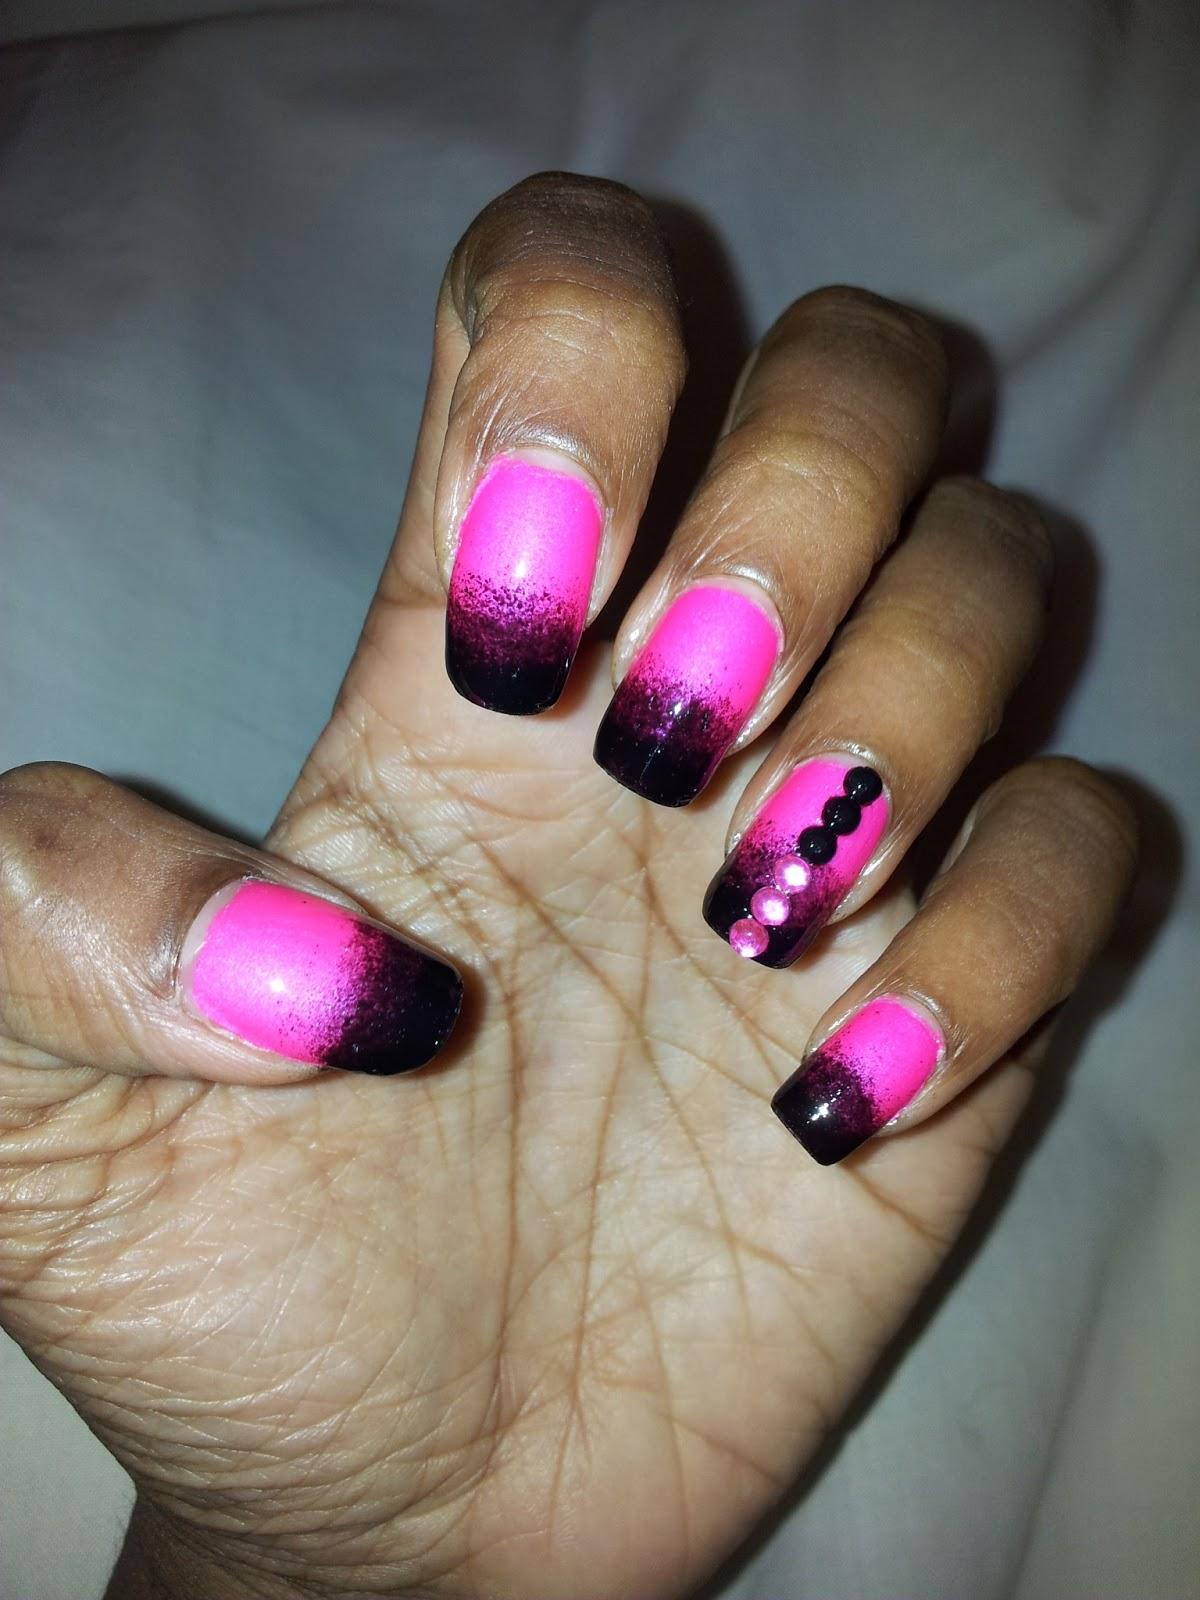 http://1.bp.blogspot.com/-heucS4vXPm8/UR6Okl1Xa_I/AAAAAAAAAd0/7sHmpD-rR-c/s1600/Pink&BlackOmbreWithStones.jpg